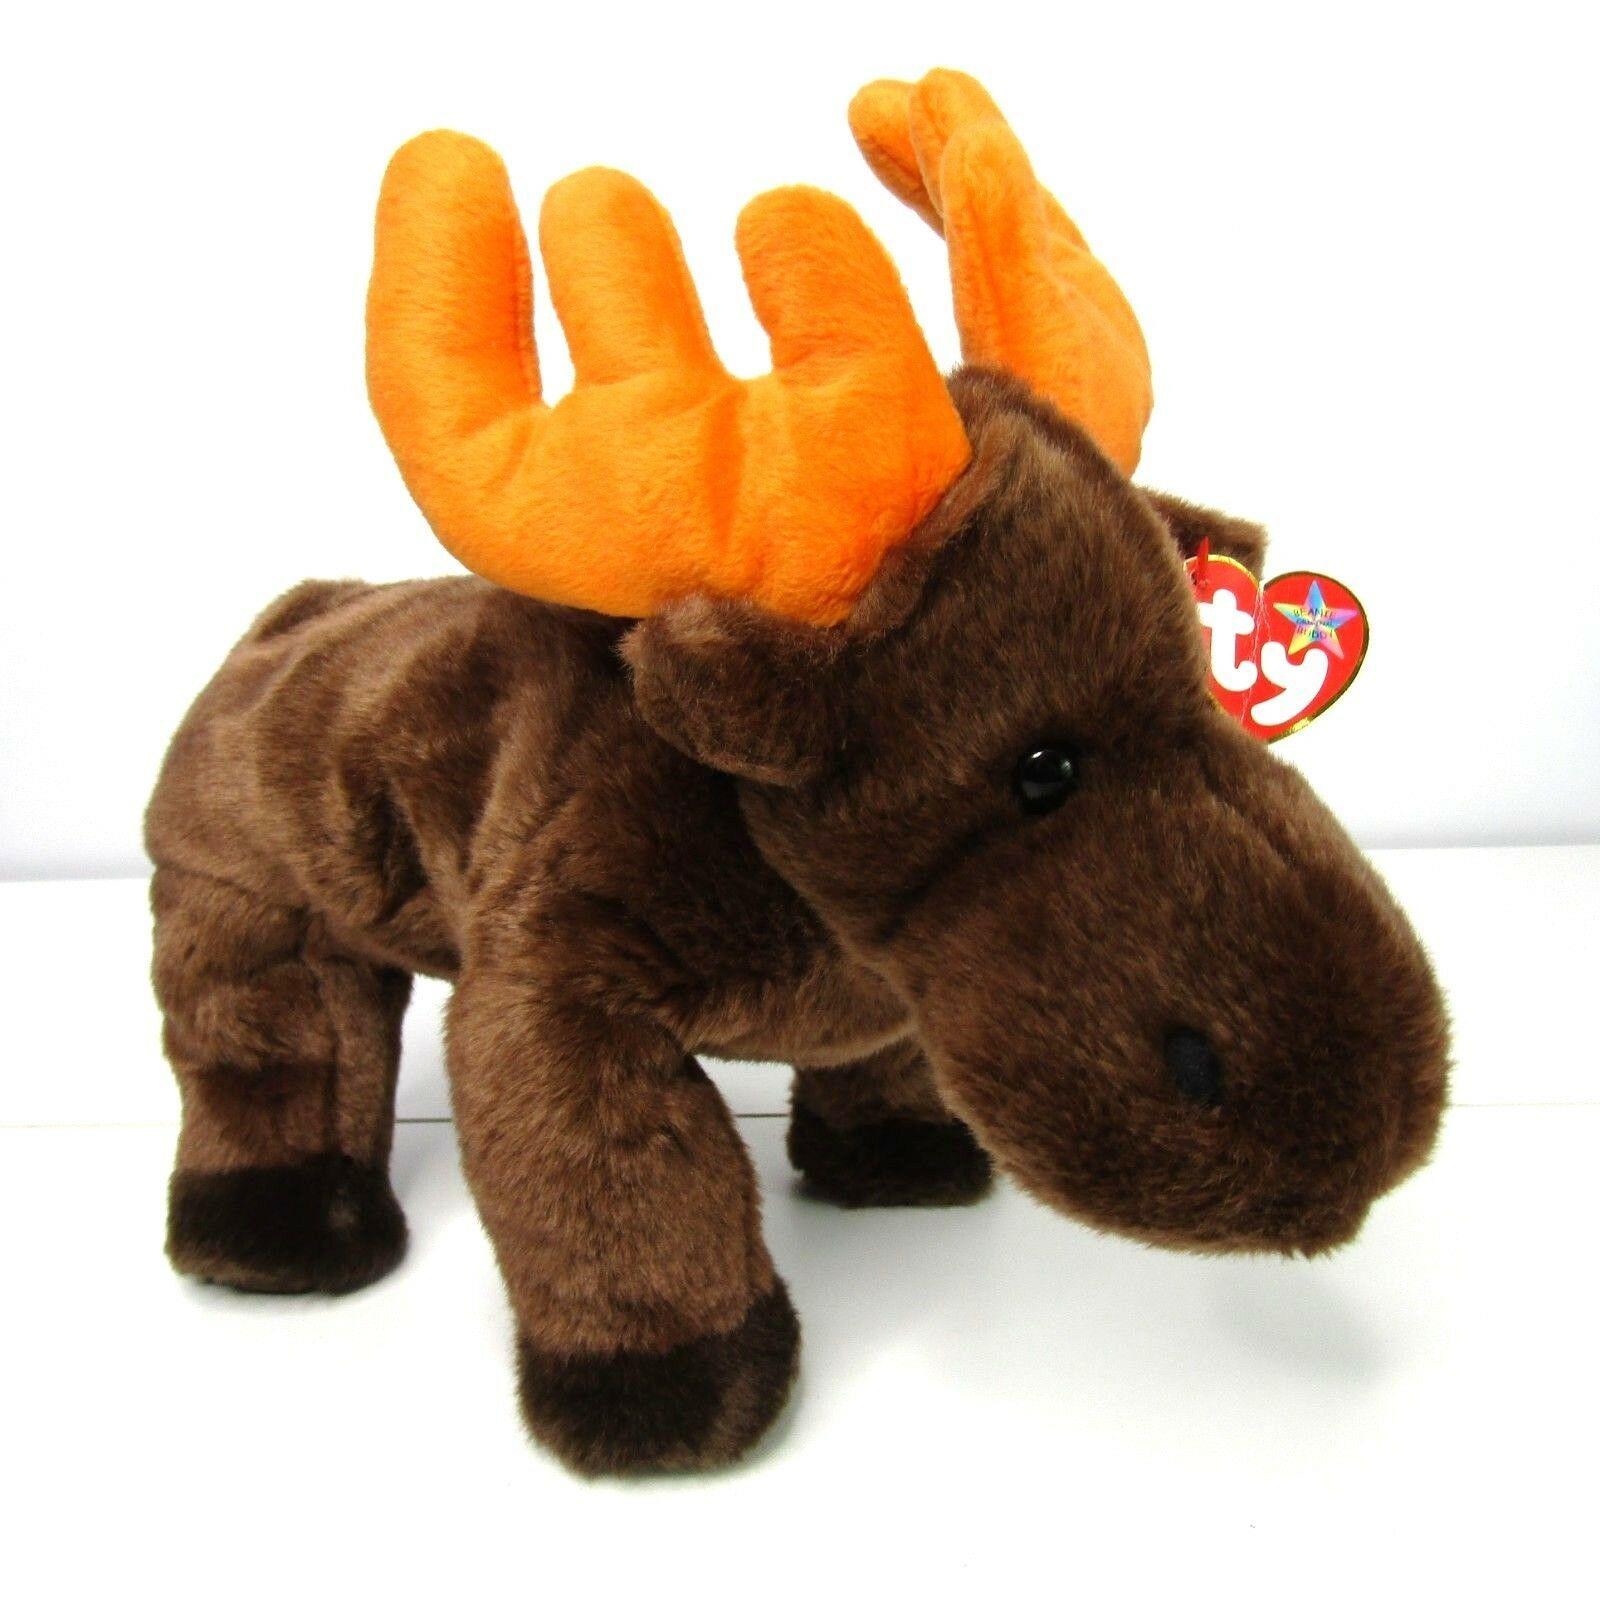 bc173c571b8 Ty Beanie Buddies Chocolate Moose Plush 12